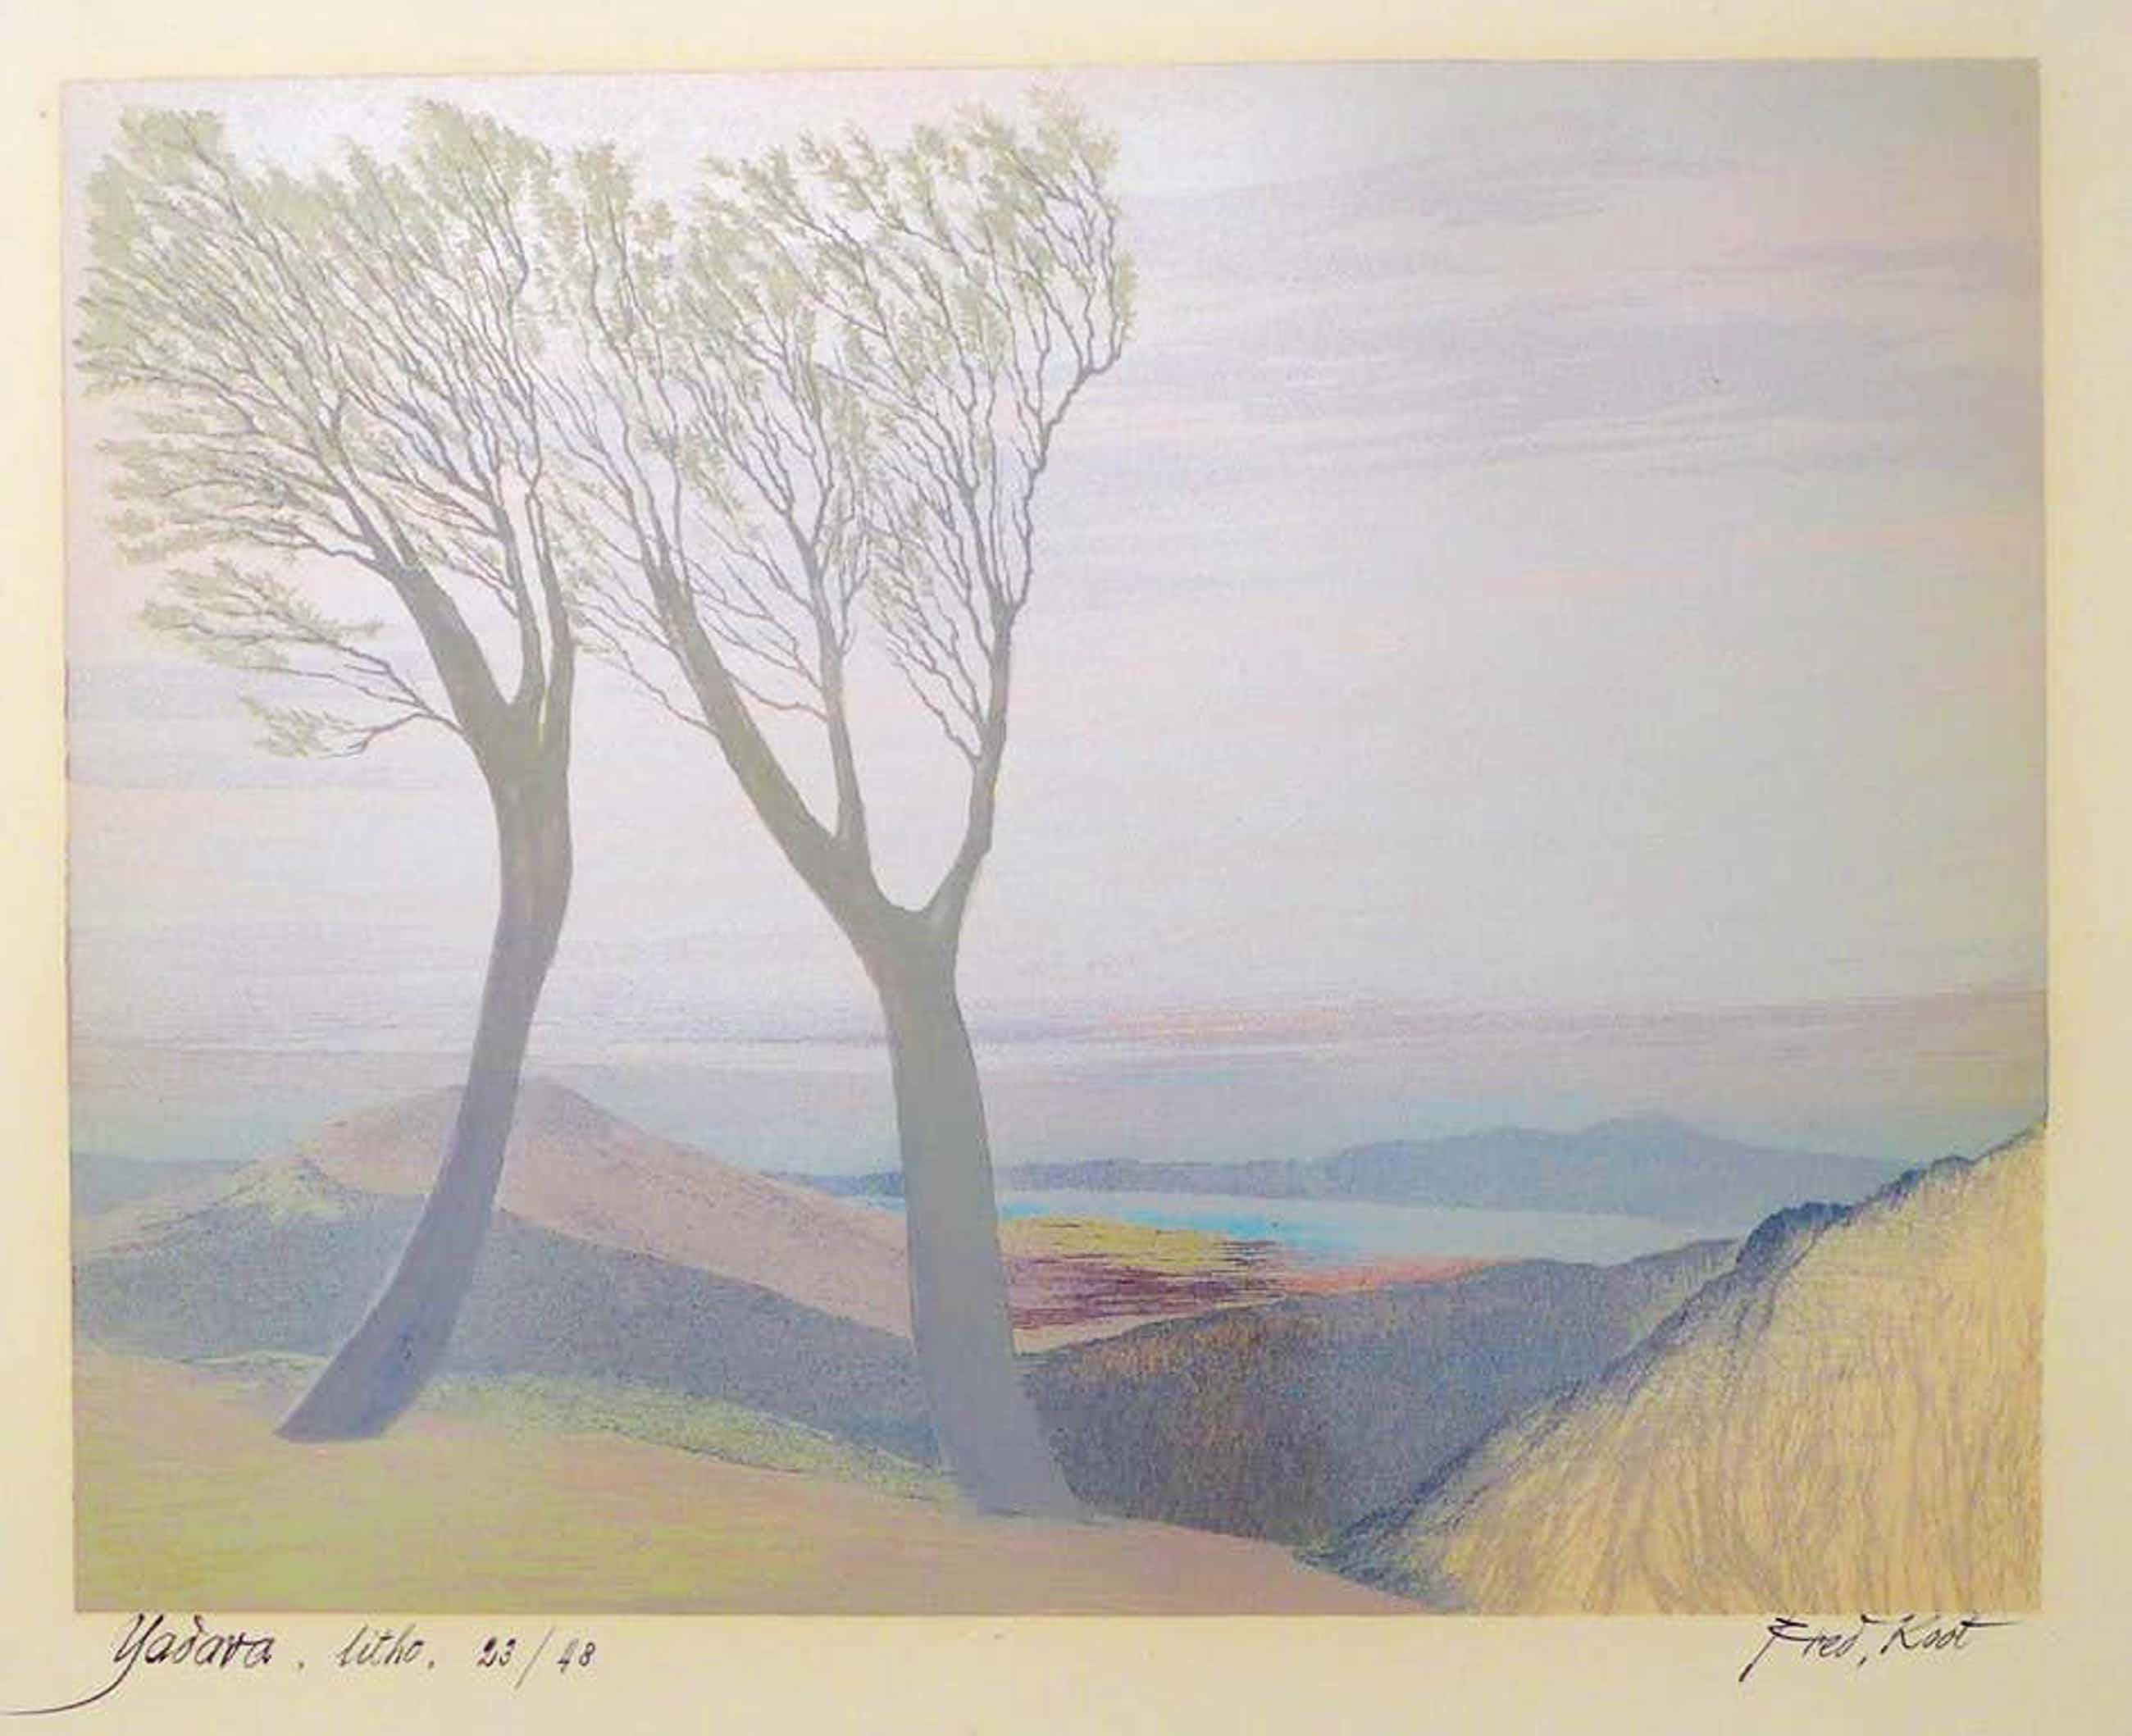 Fred Koot - Fred Koot, litho, titel Yadava. oplage 23/48 beeldformaat 34.7 x 44.3 cm. kopen? Bied vanaf 50!